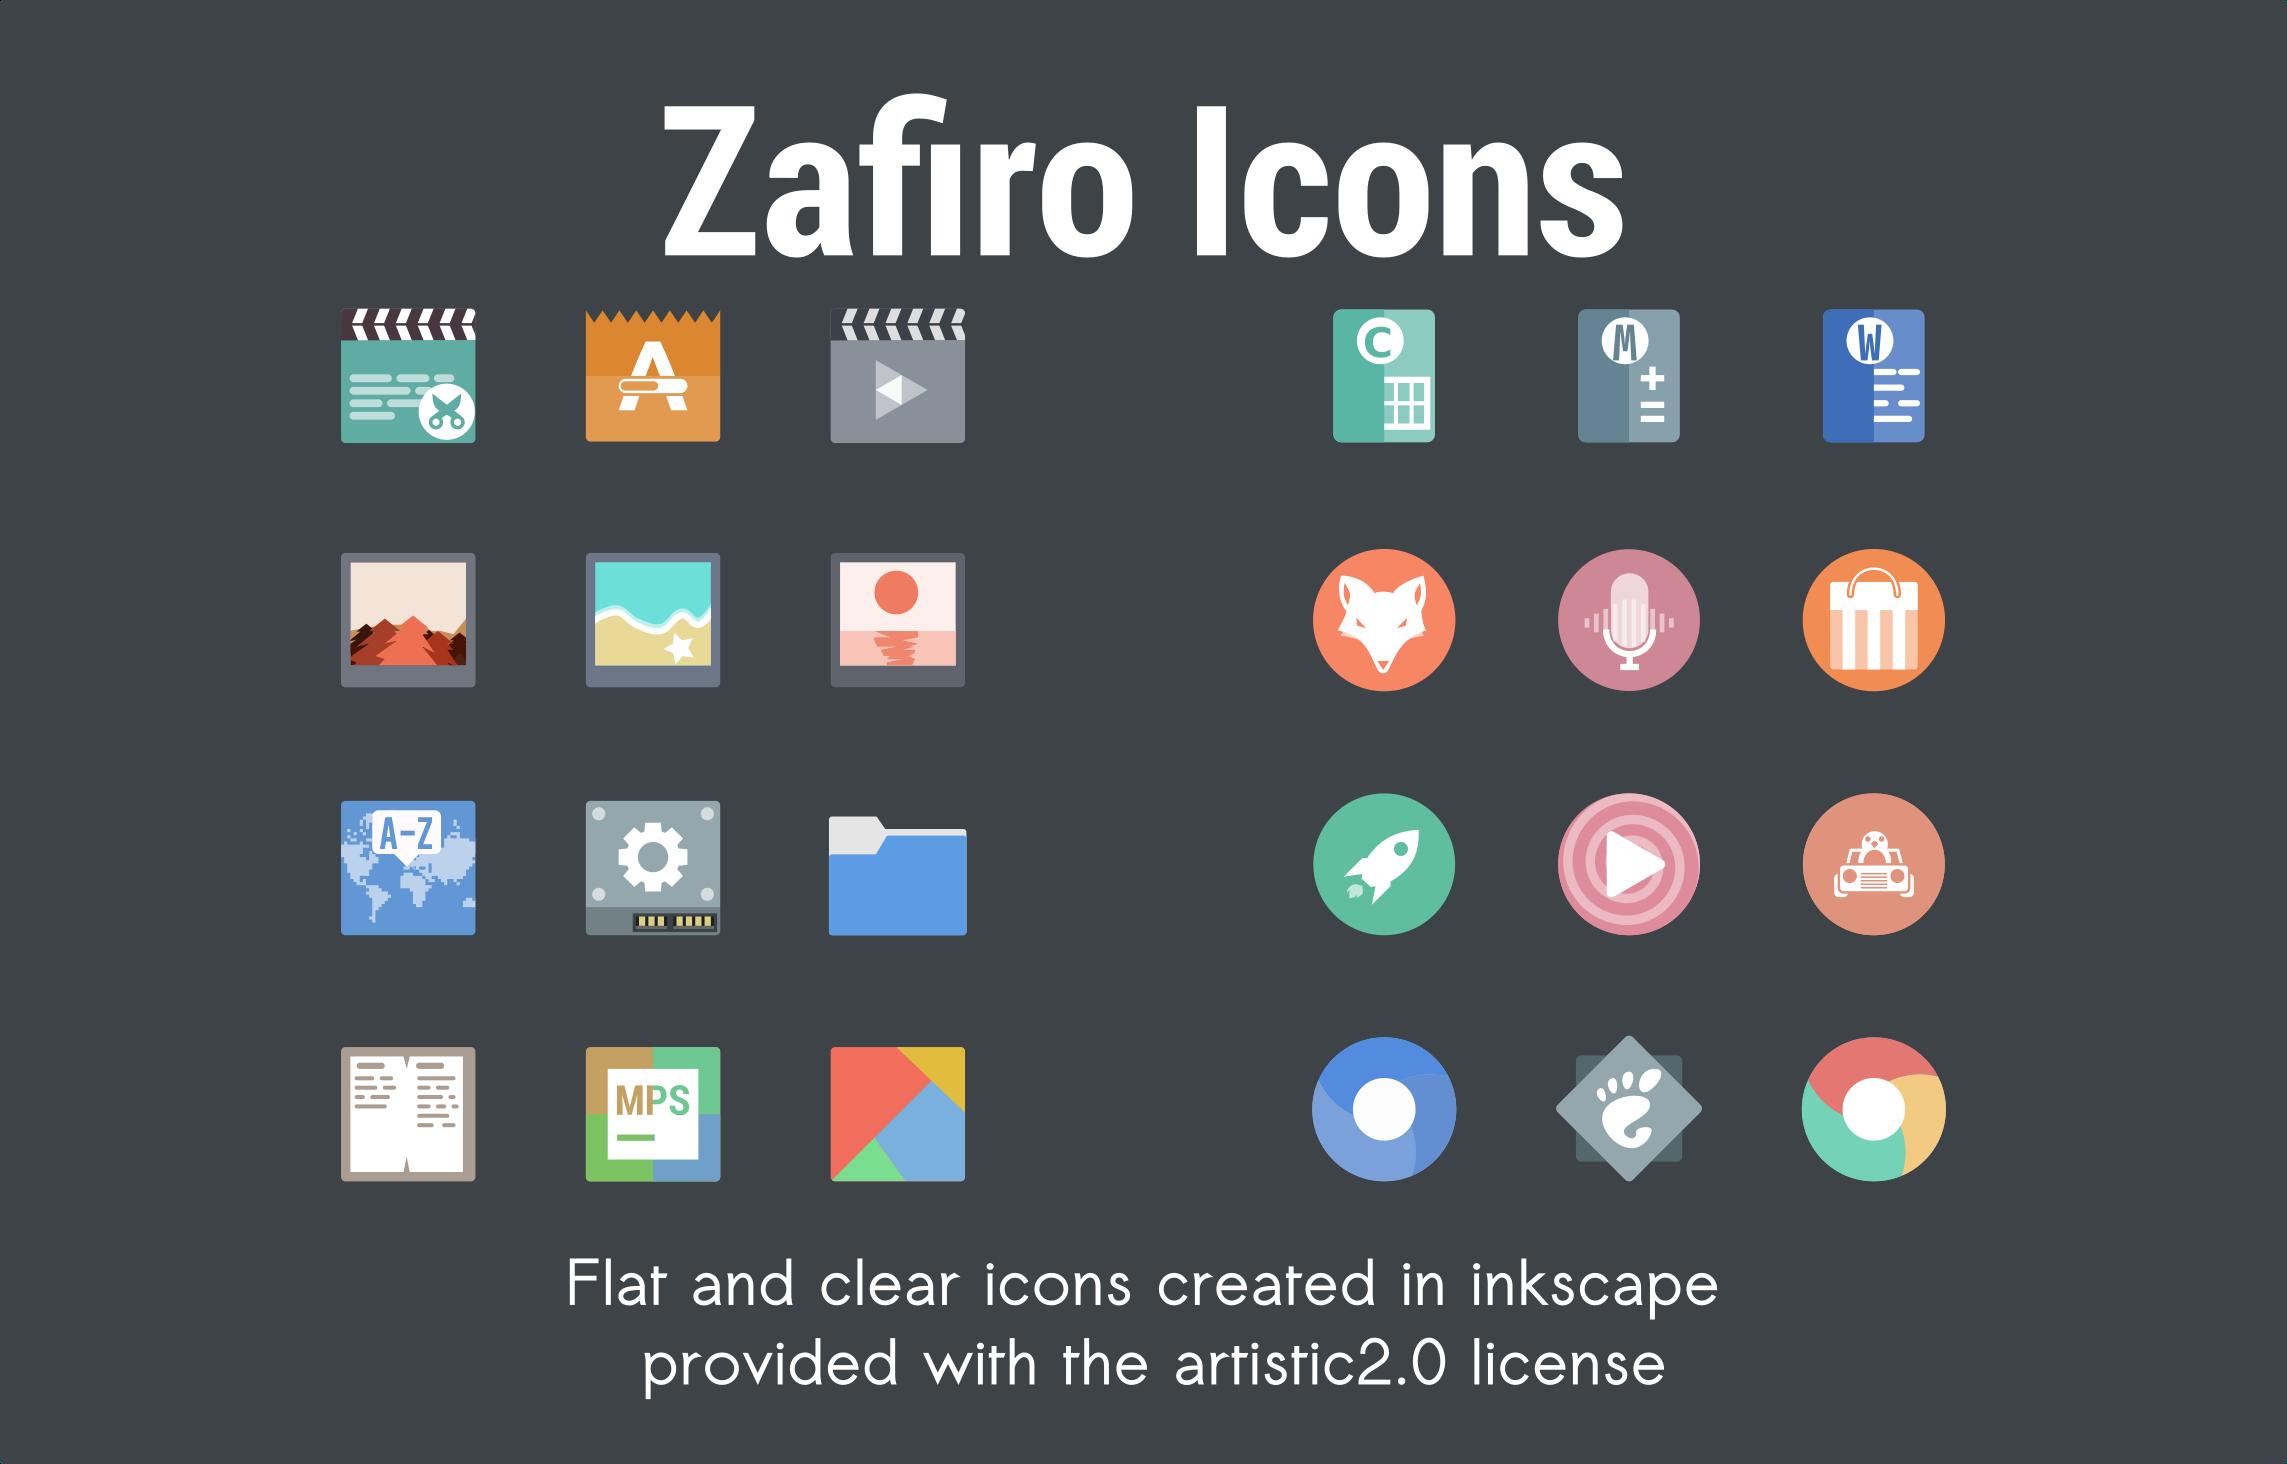 Zafiro is a Softer Alternative Icon Theme for Linux Desktops